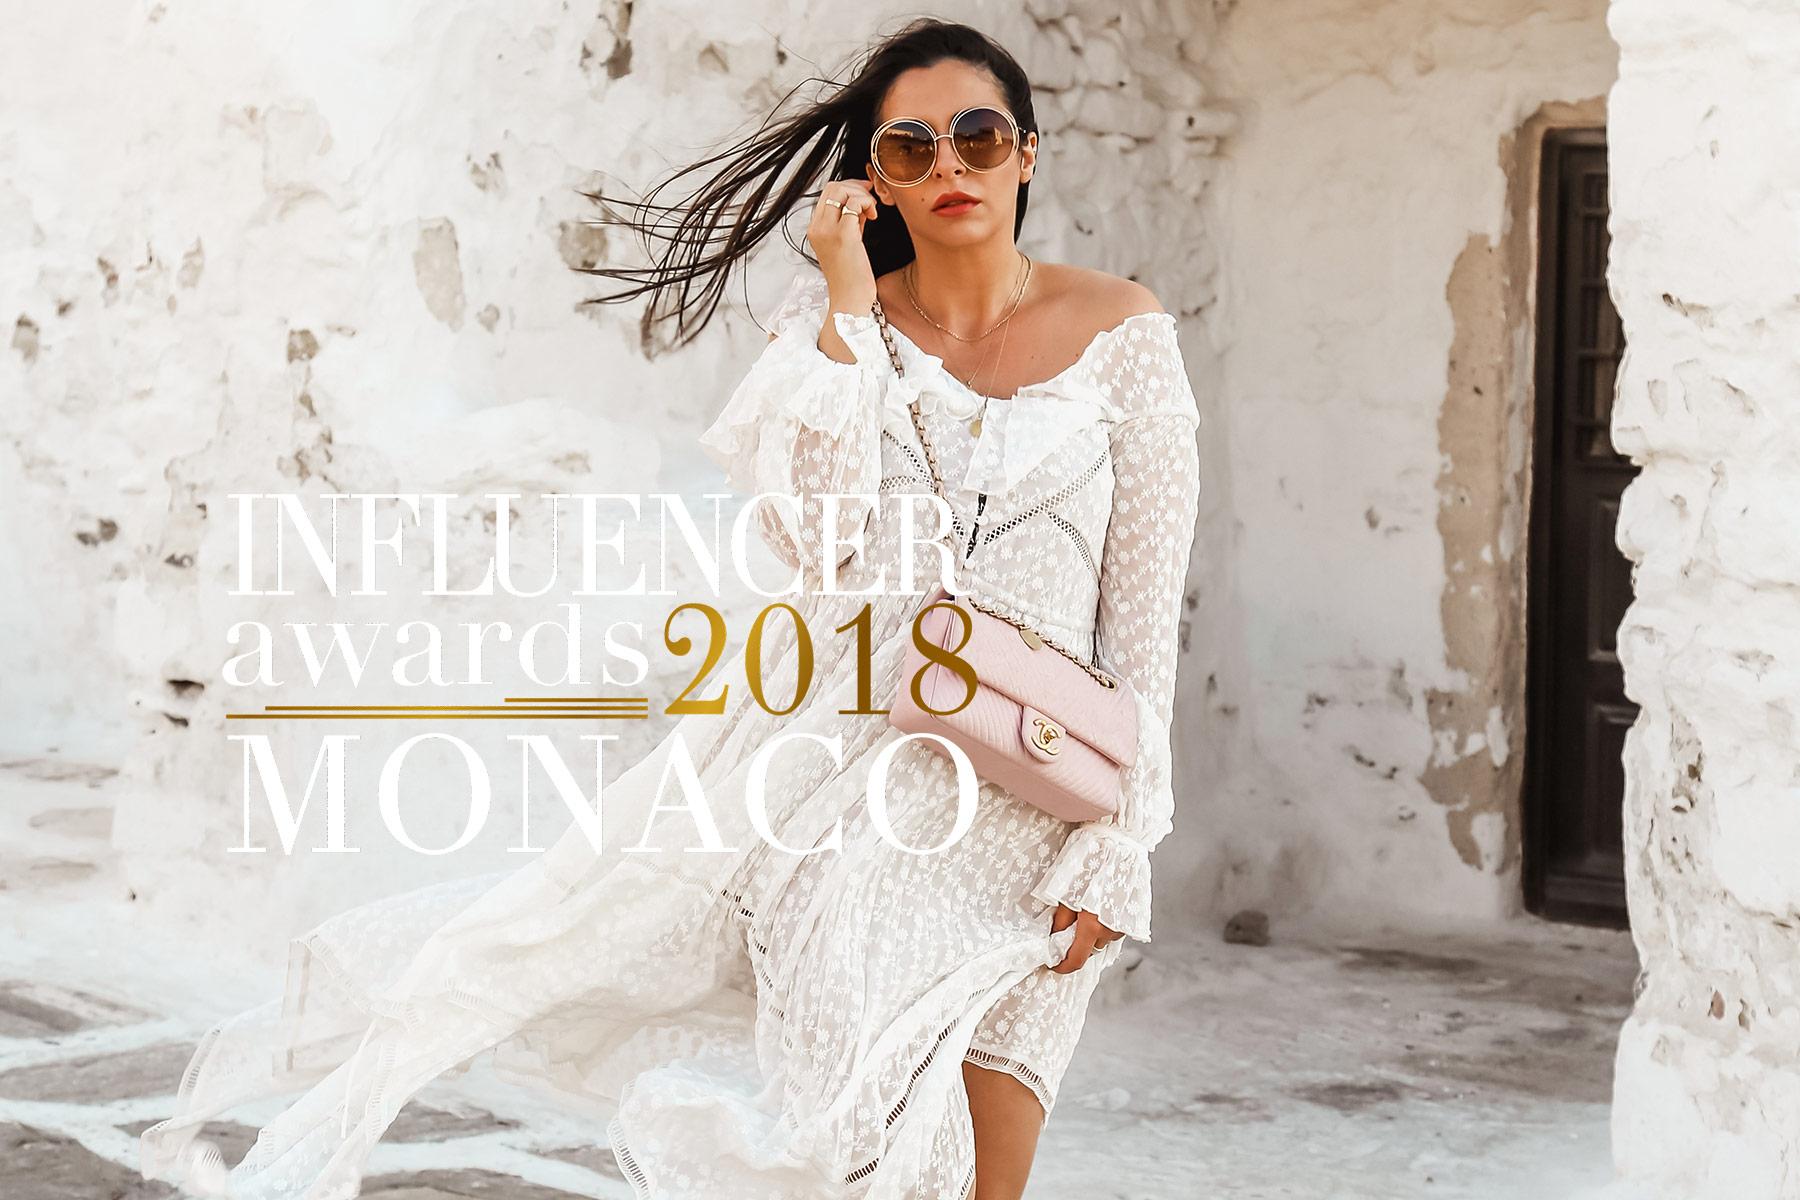 Influencer Awards Monaco 2018 IAM - Vote for Stella Asteria - Fashion Influencer for 2018